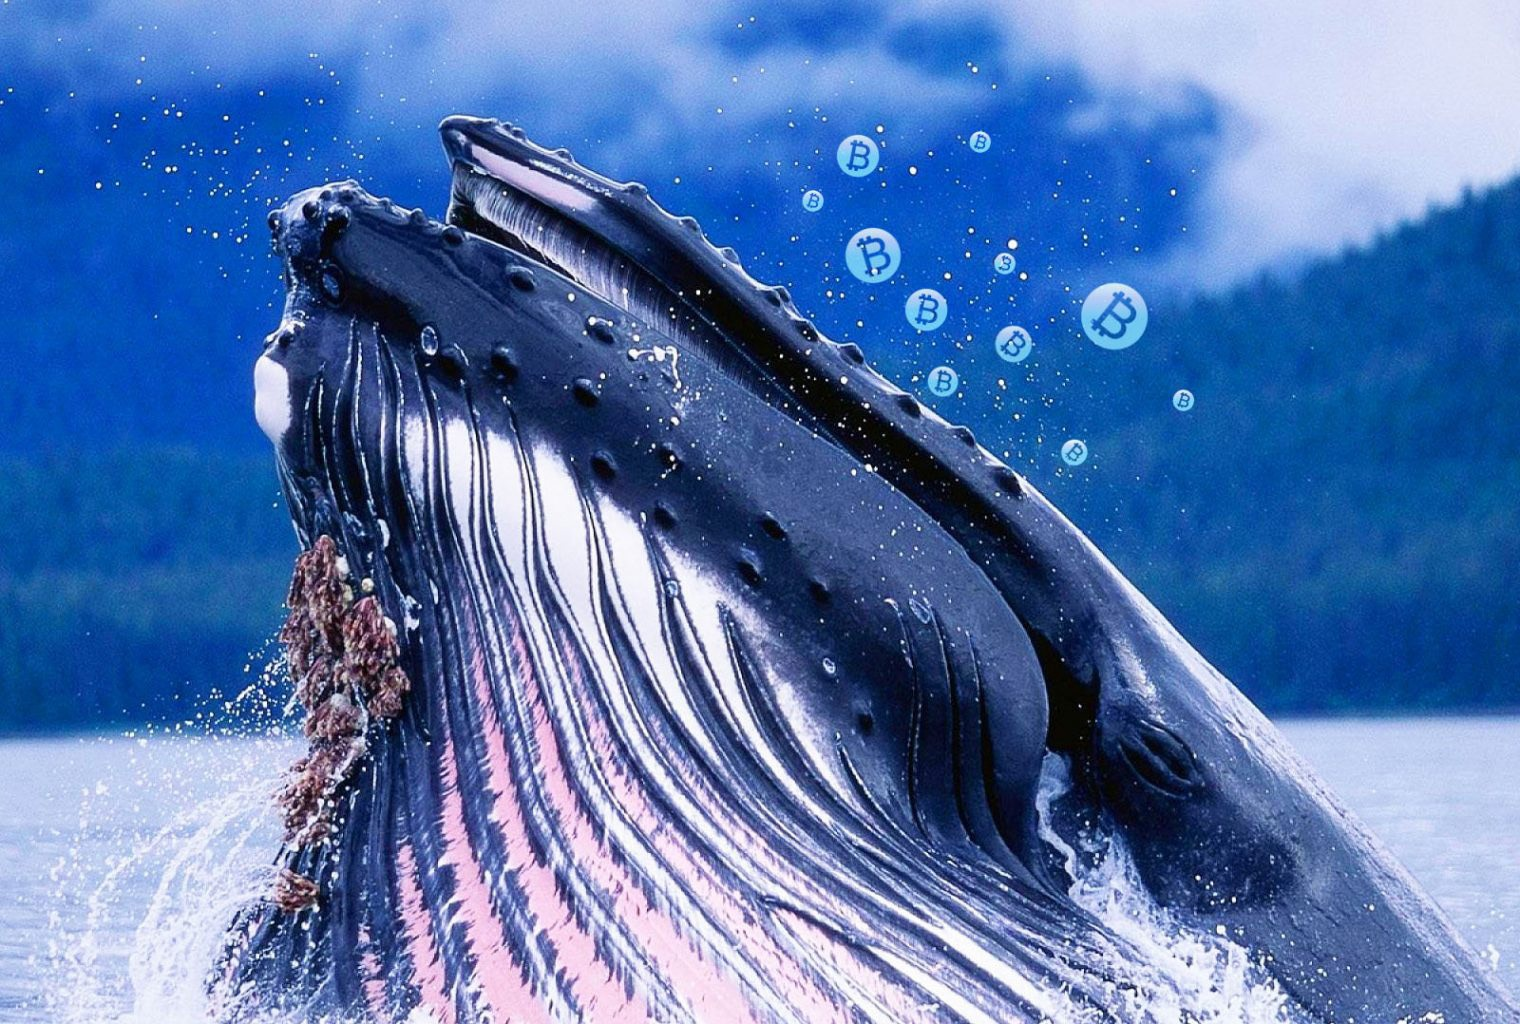 altcoin balina servet dağılımı